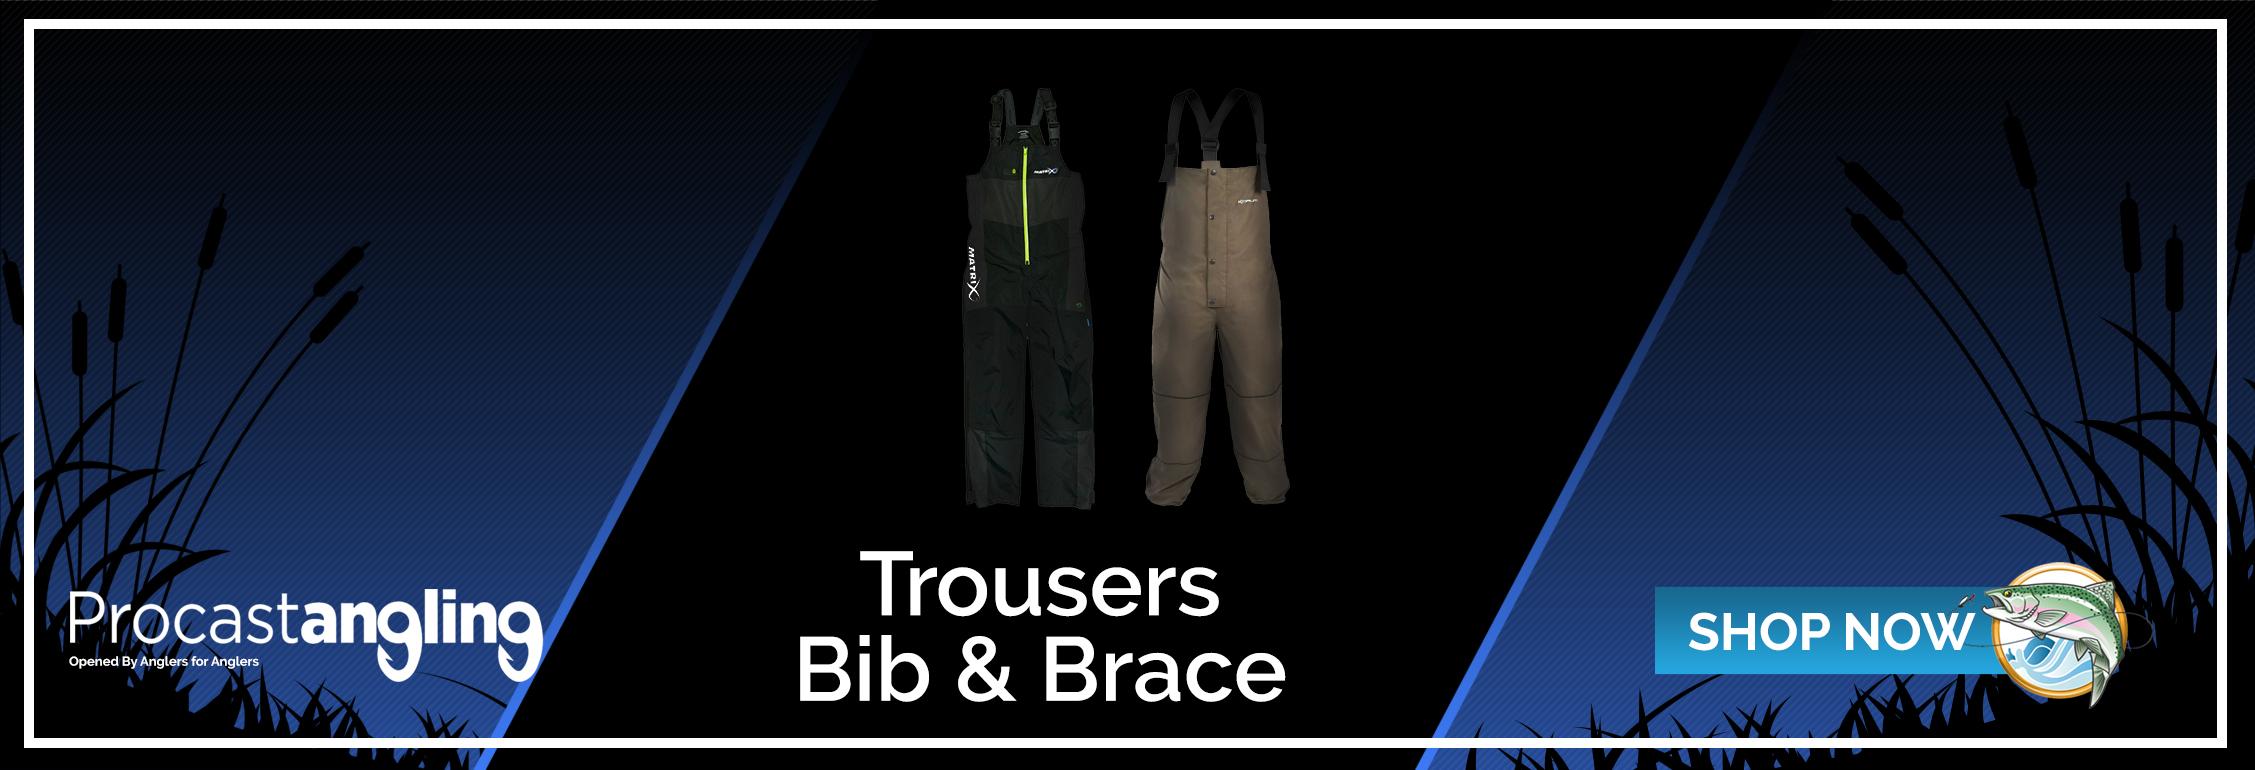 TROUSERS - BIB & BRACE